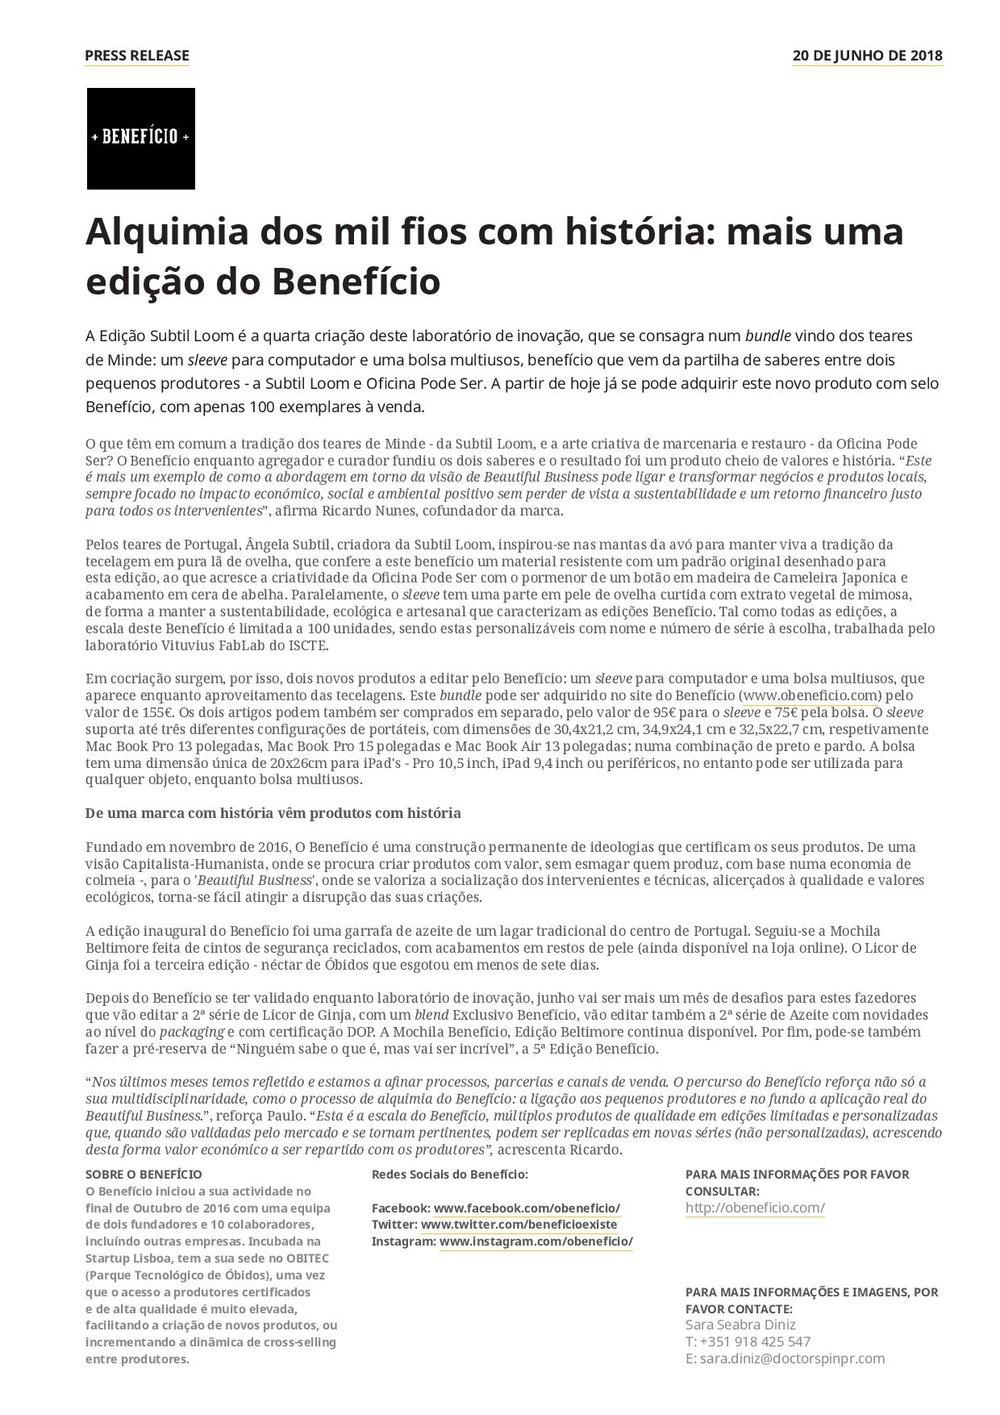 PR_Edição Subtil Loom-page-001.jpg